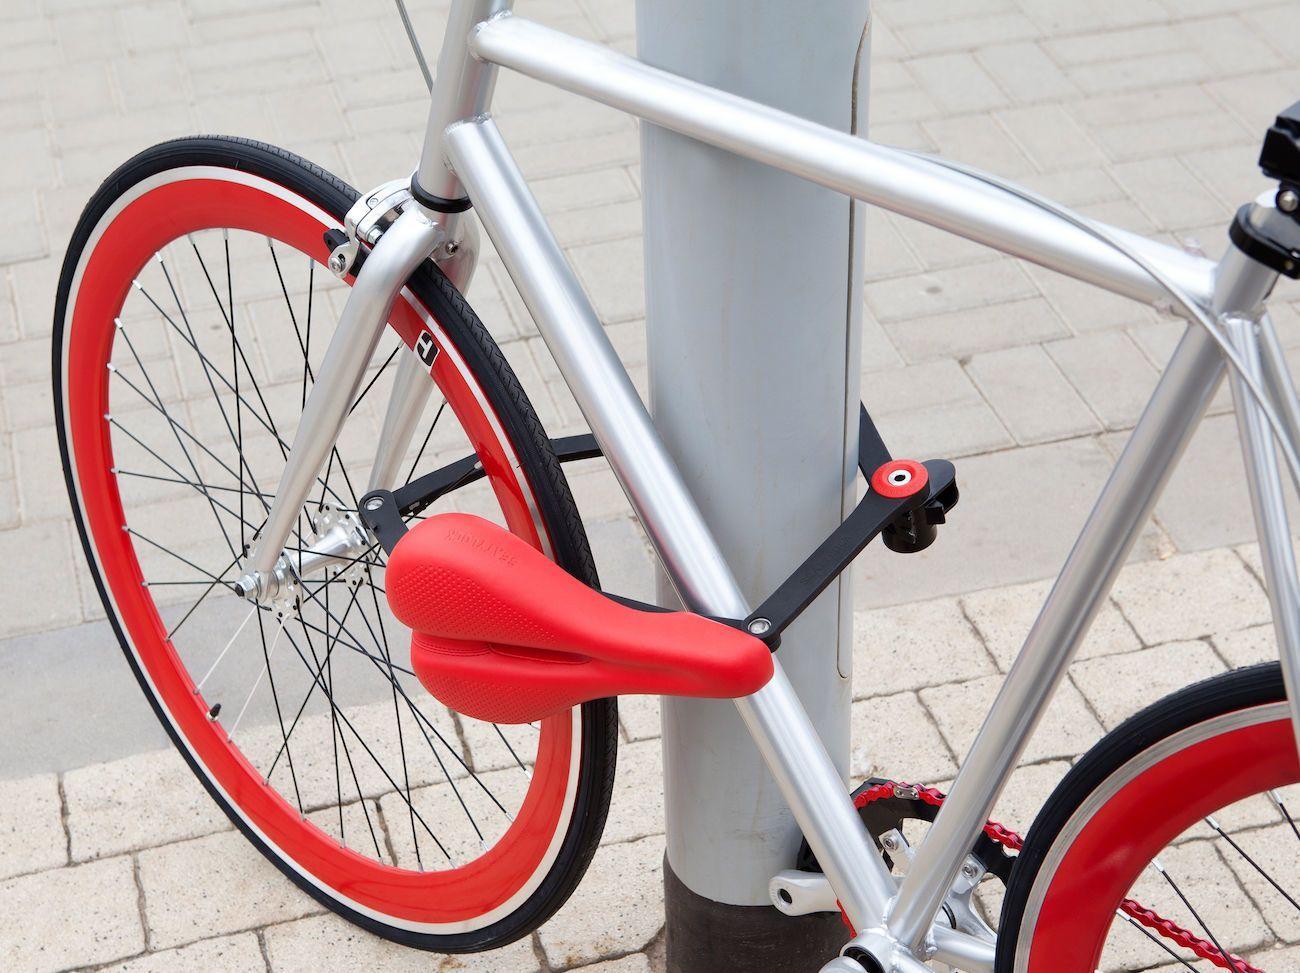 Seatylock Anti Theft Bicycle Saddle Bike Lock Bicycle Lock